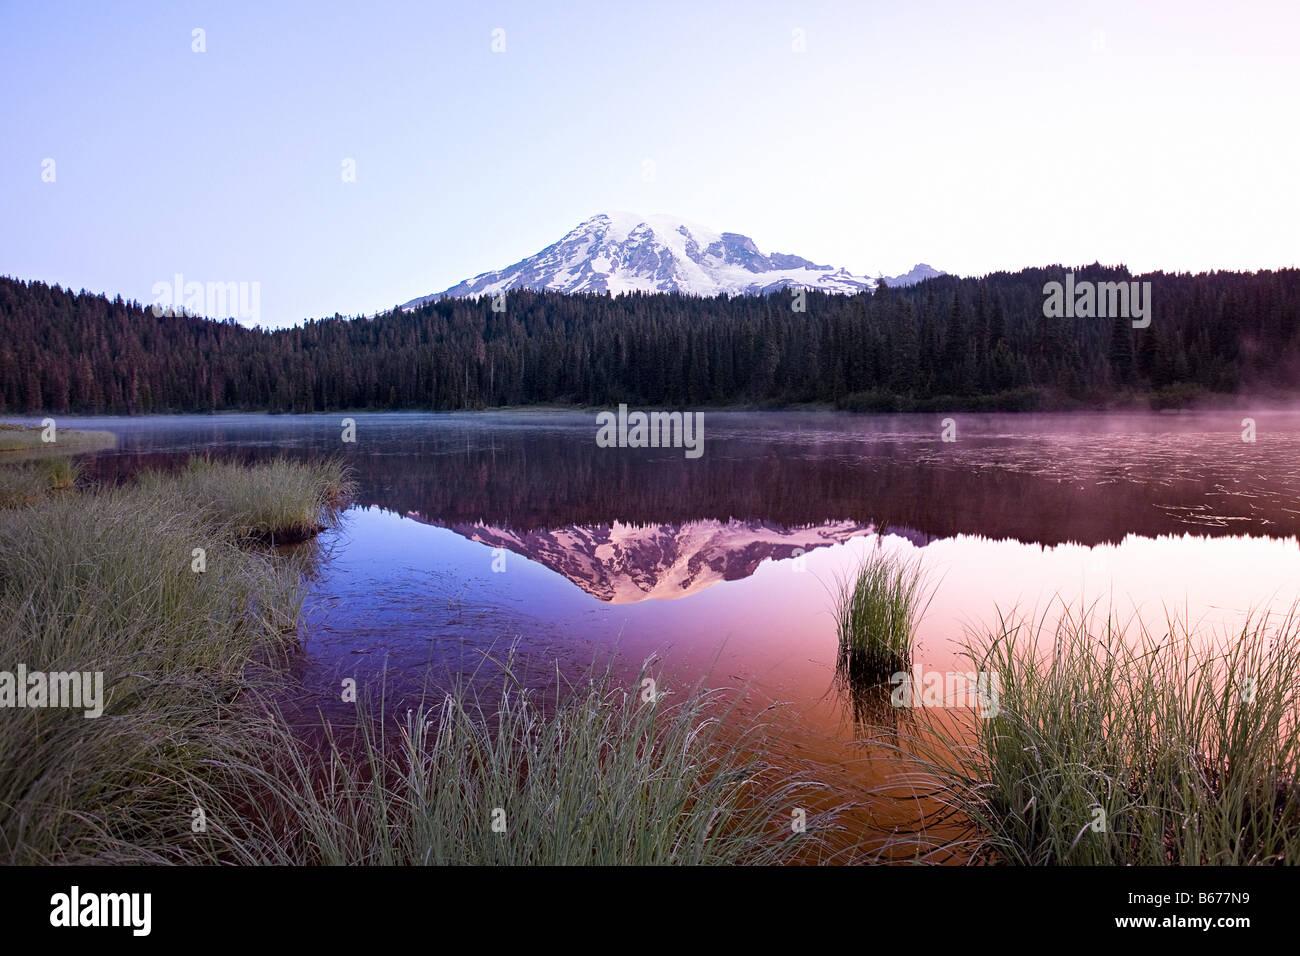 Sunrise at mount rainier - Stock Image